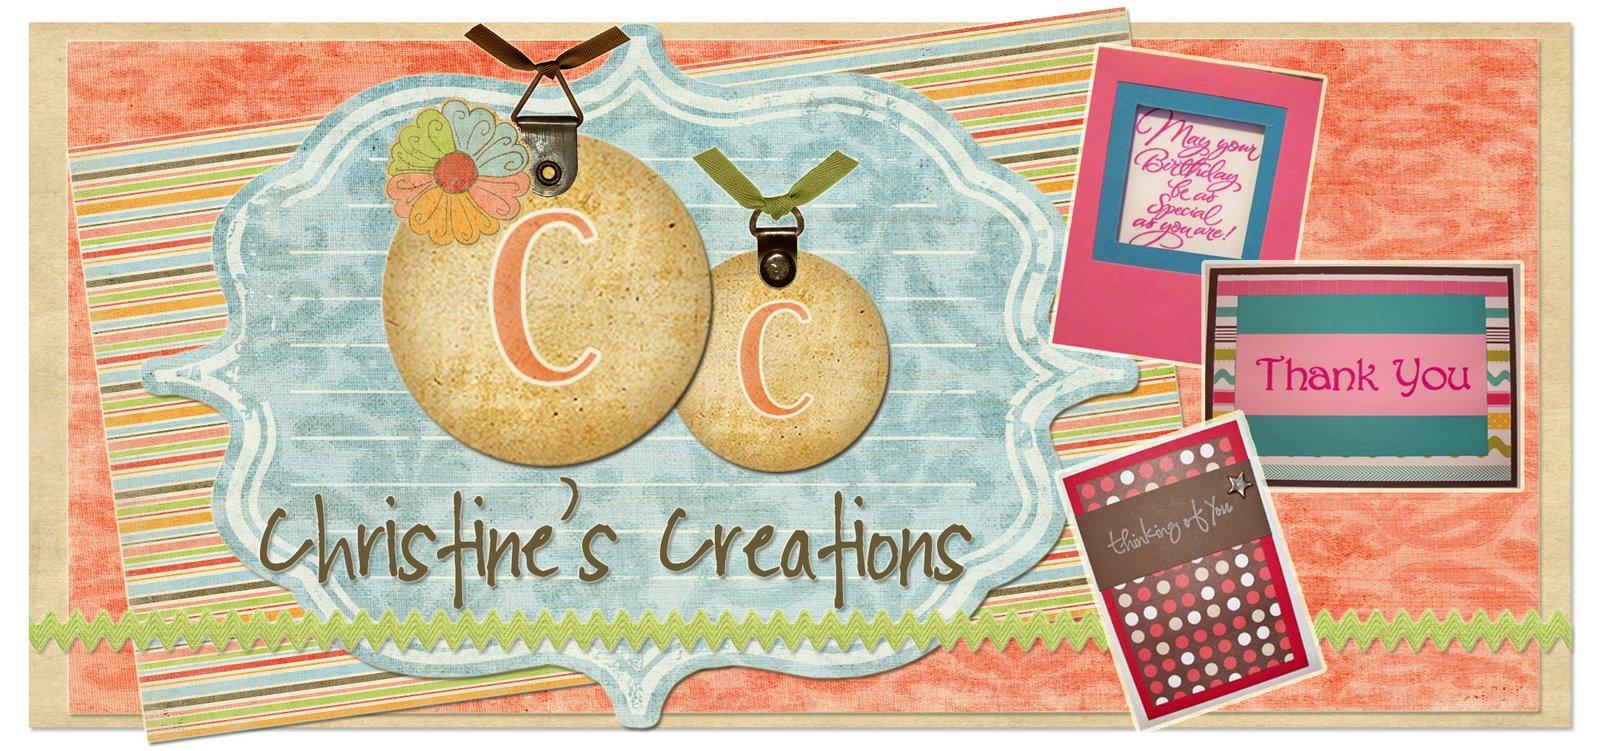 Christine's Creations